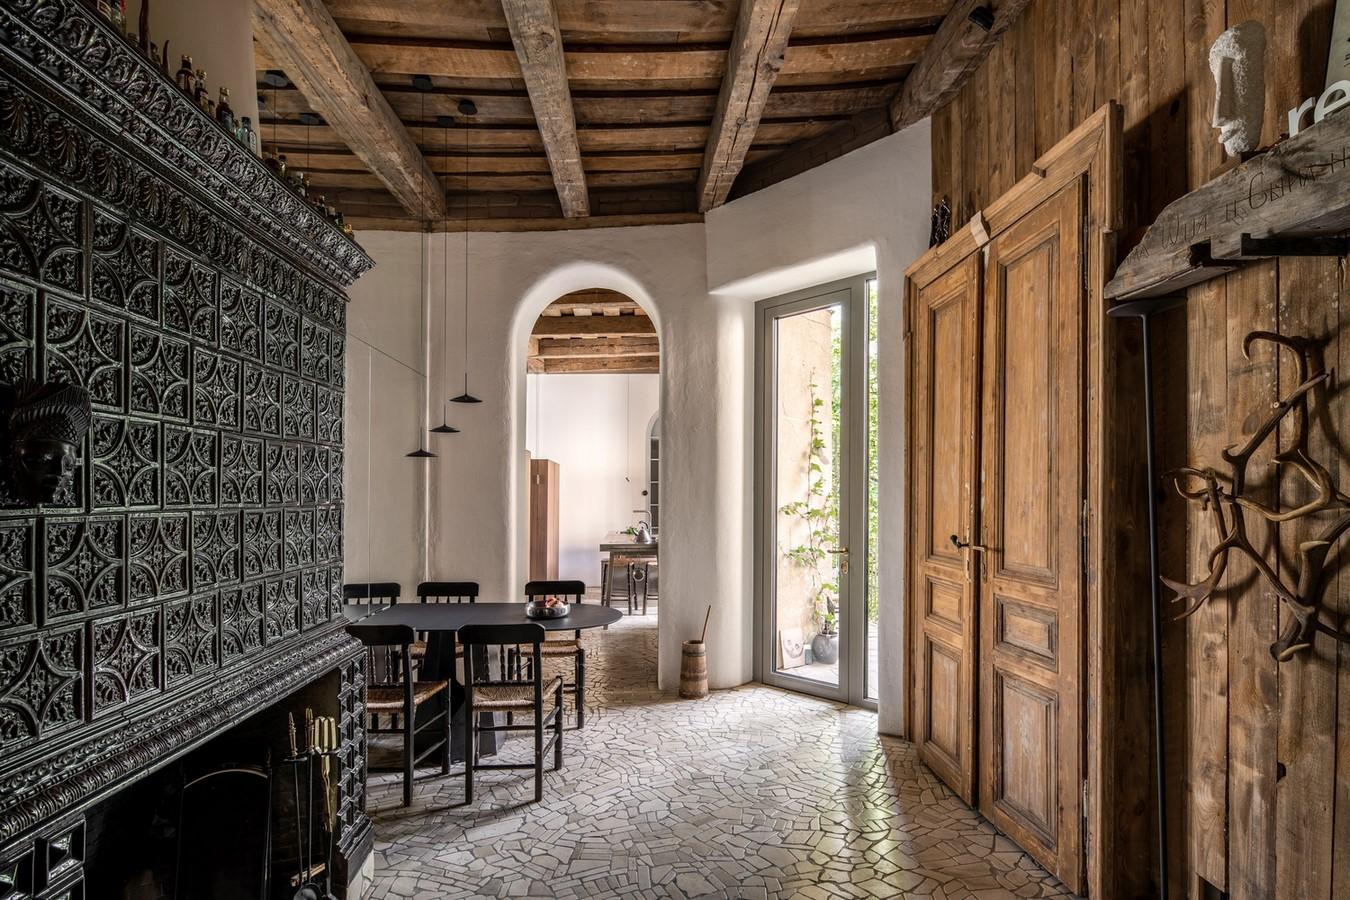 15 beautiful vintage apartments around the world - Sheet21